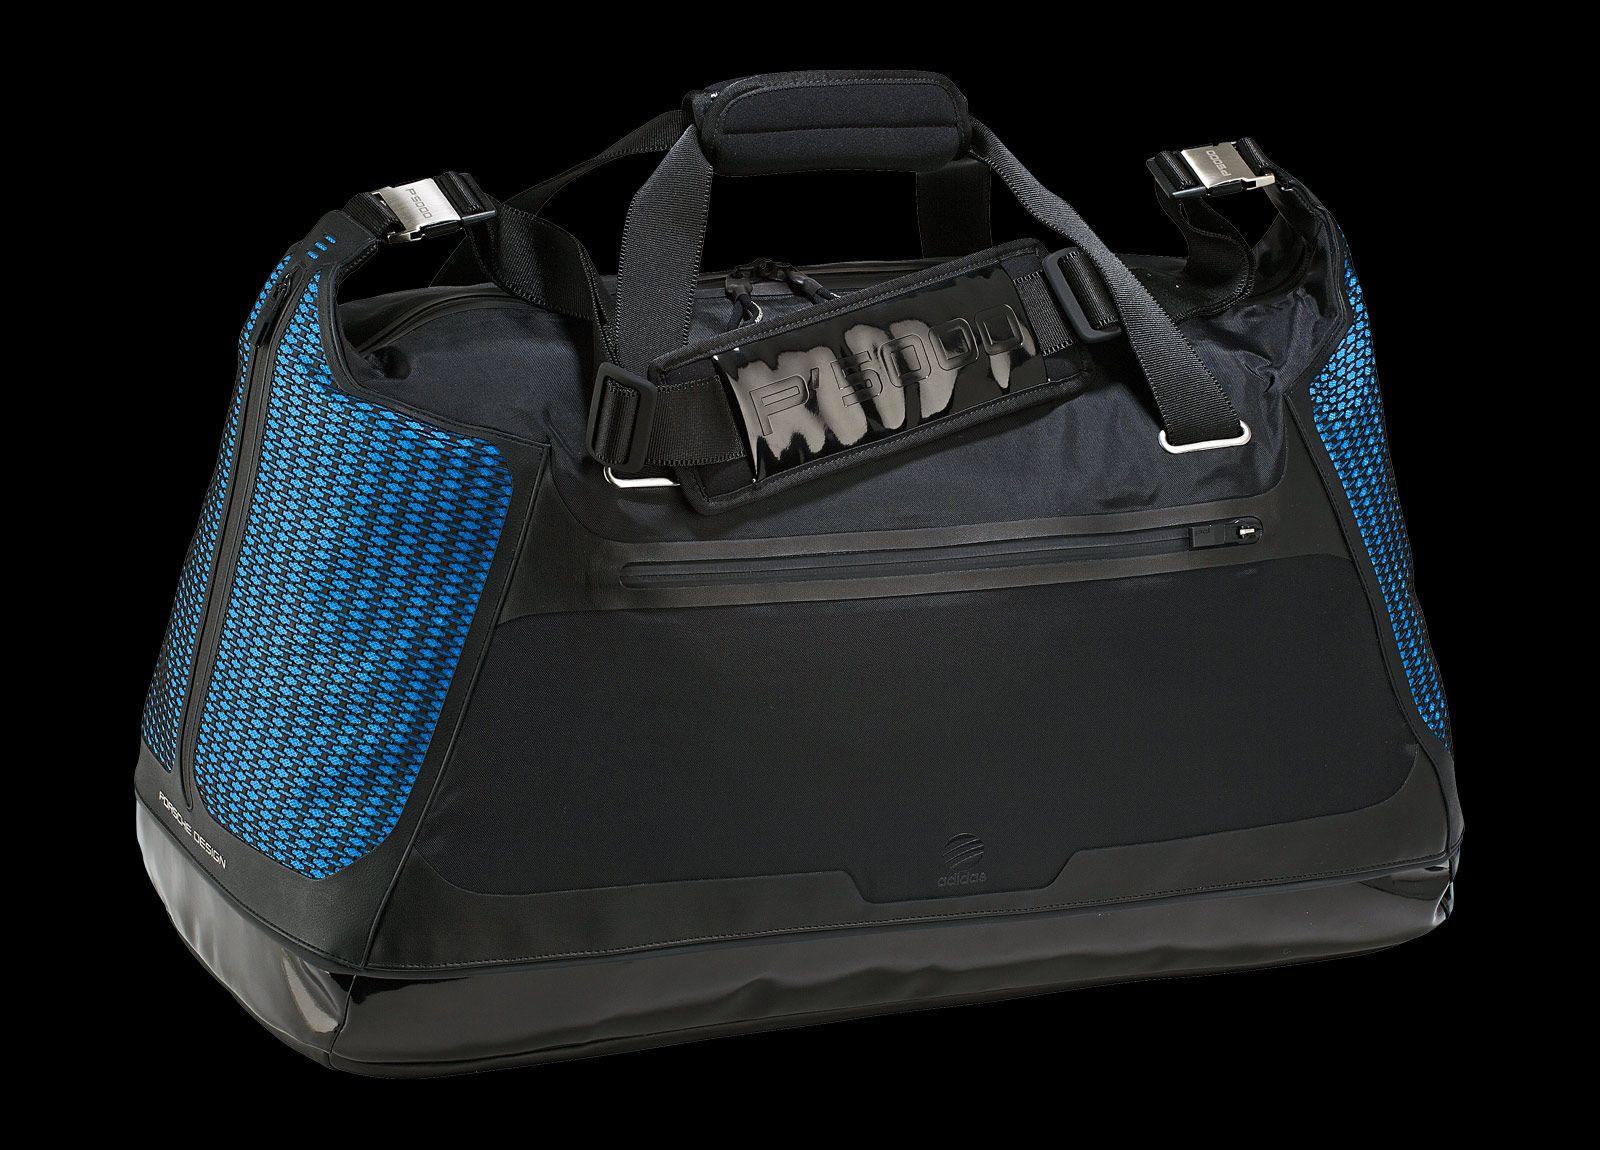 f082a2a9fdb8 Porsche Design RUN Functional Gym Bag Blue